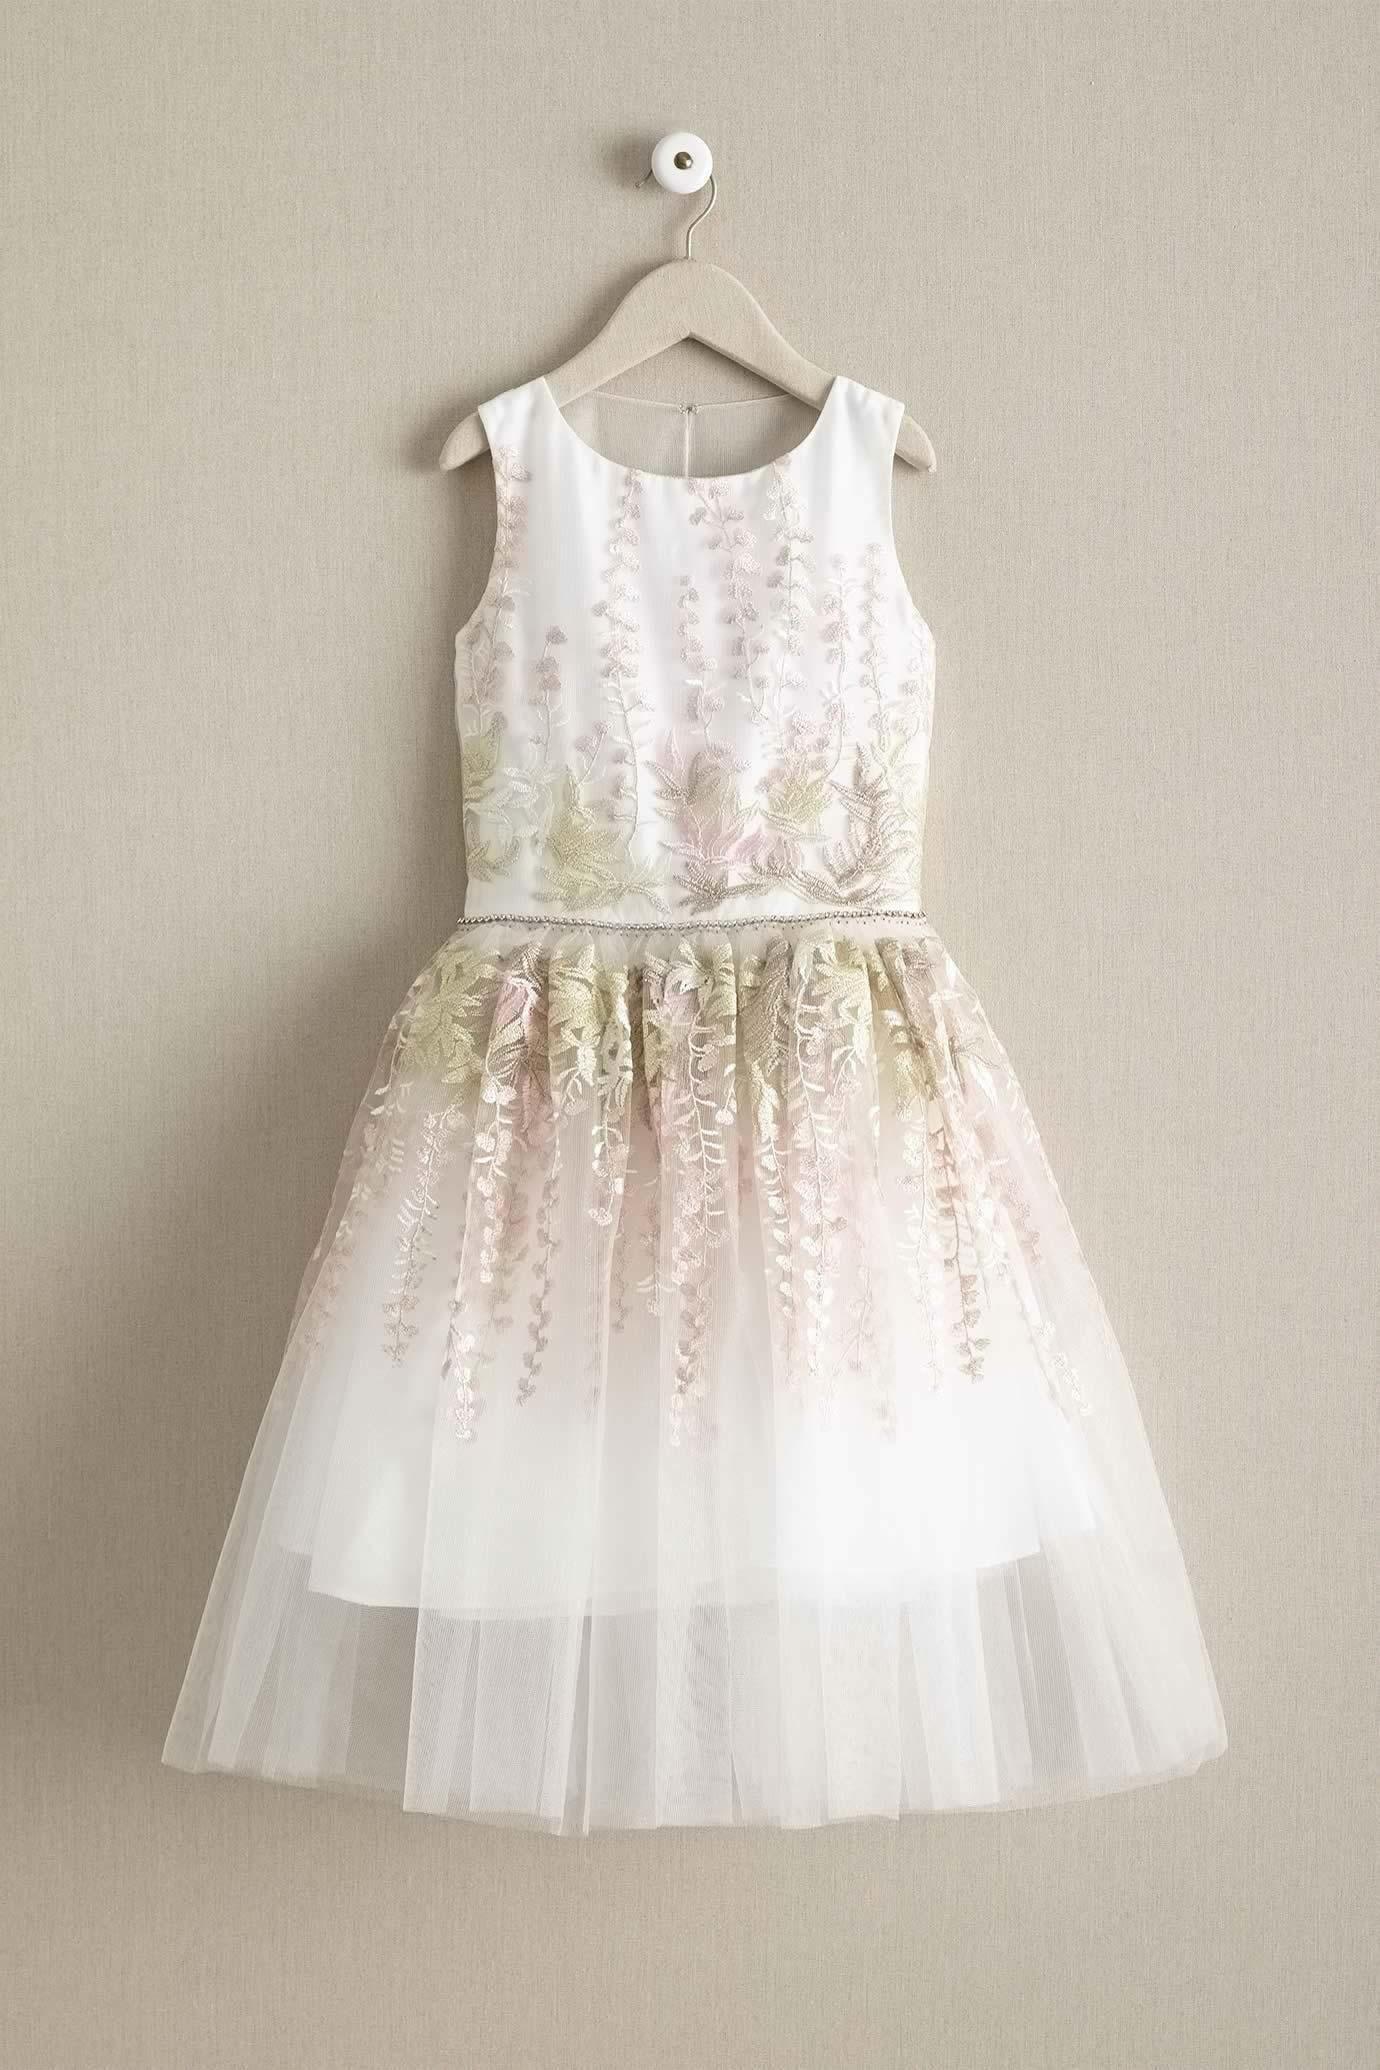 957753e9885 David Charles Girls Pastel Wisteria Dress